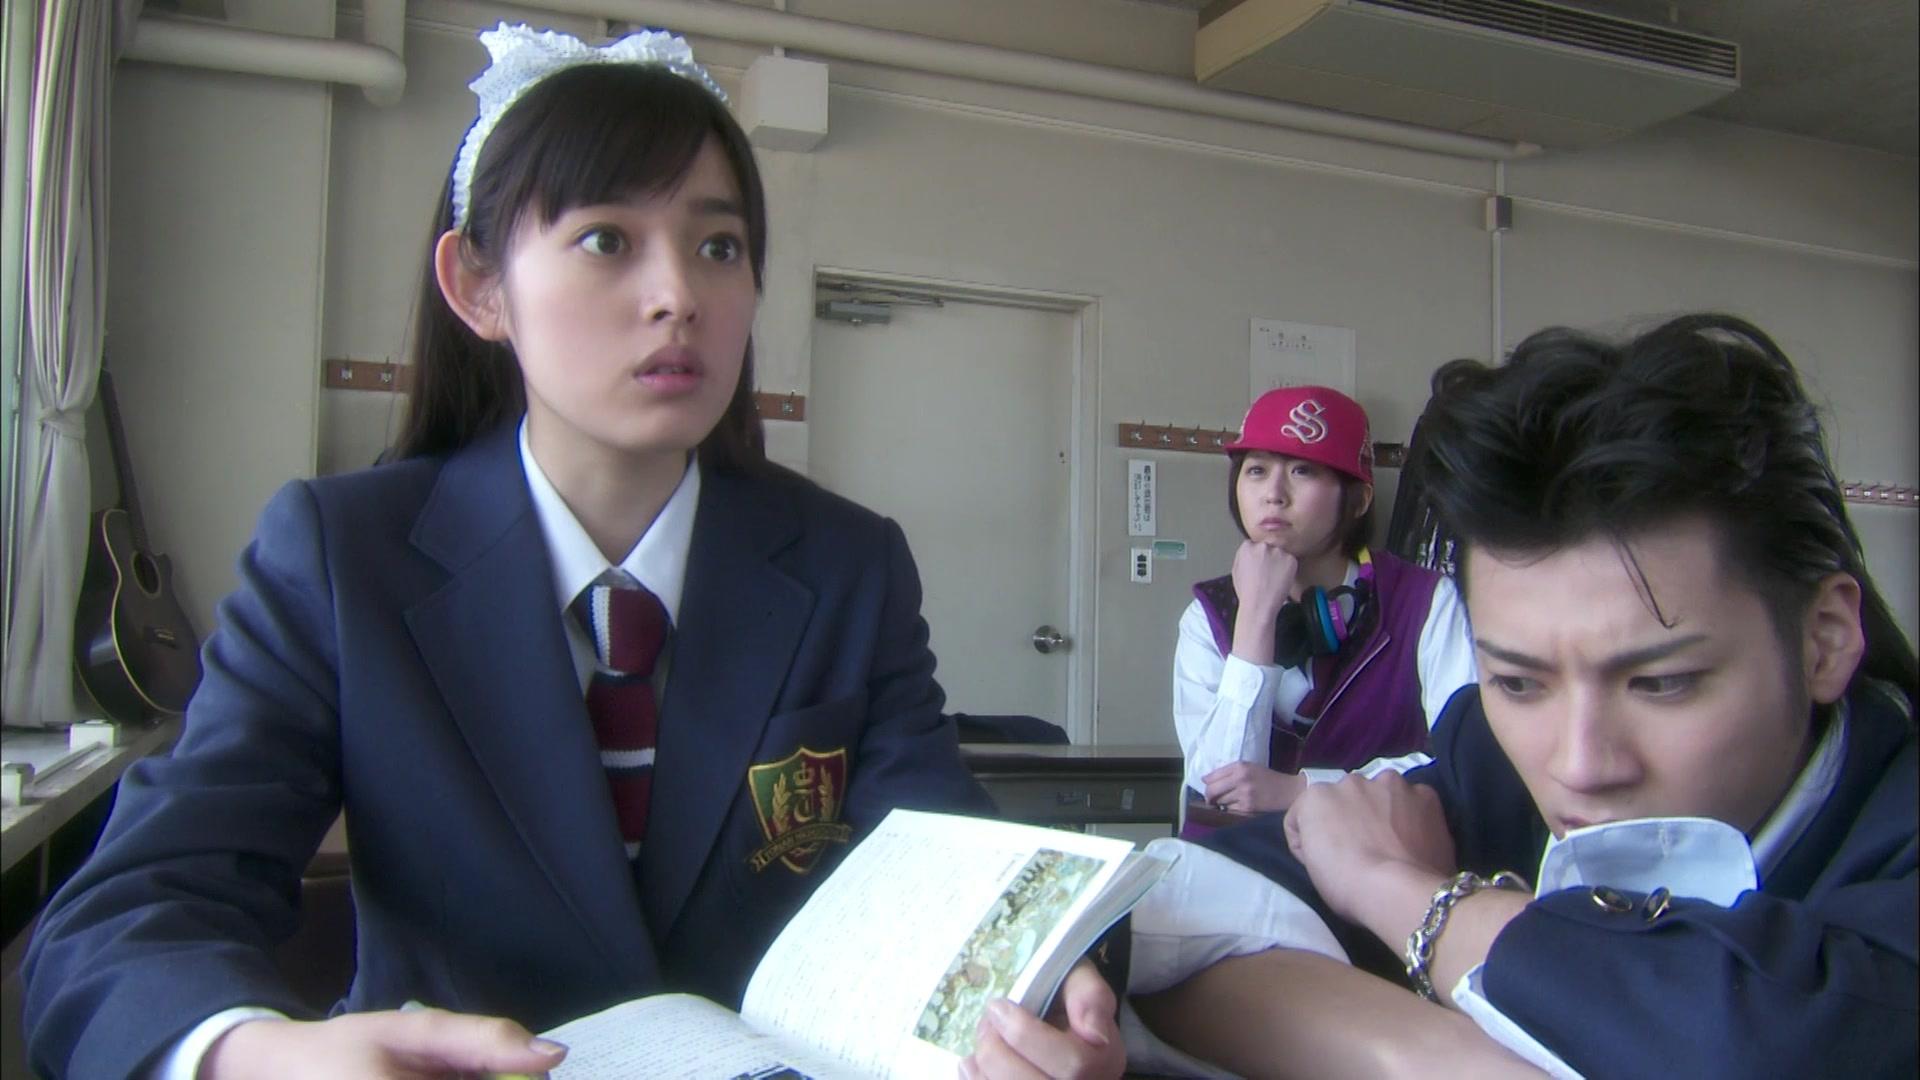 Mischievous Kiss - Love in Tokyo Episode 2, Entrance Exam of Love